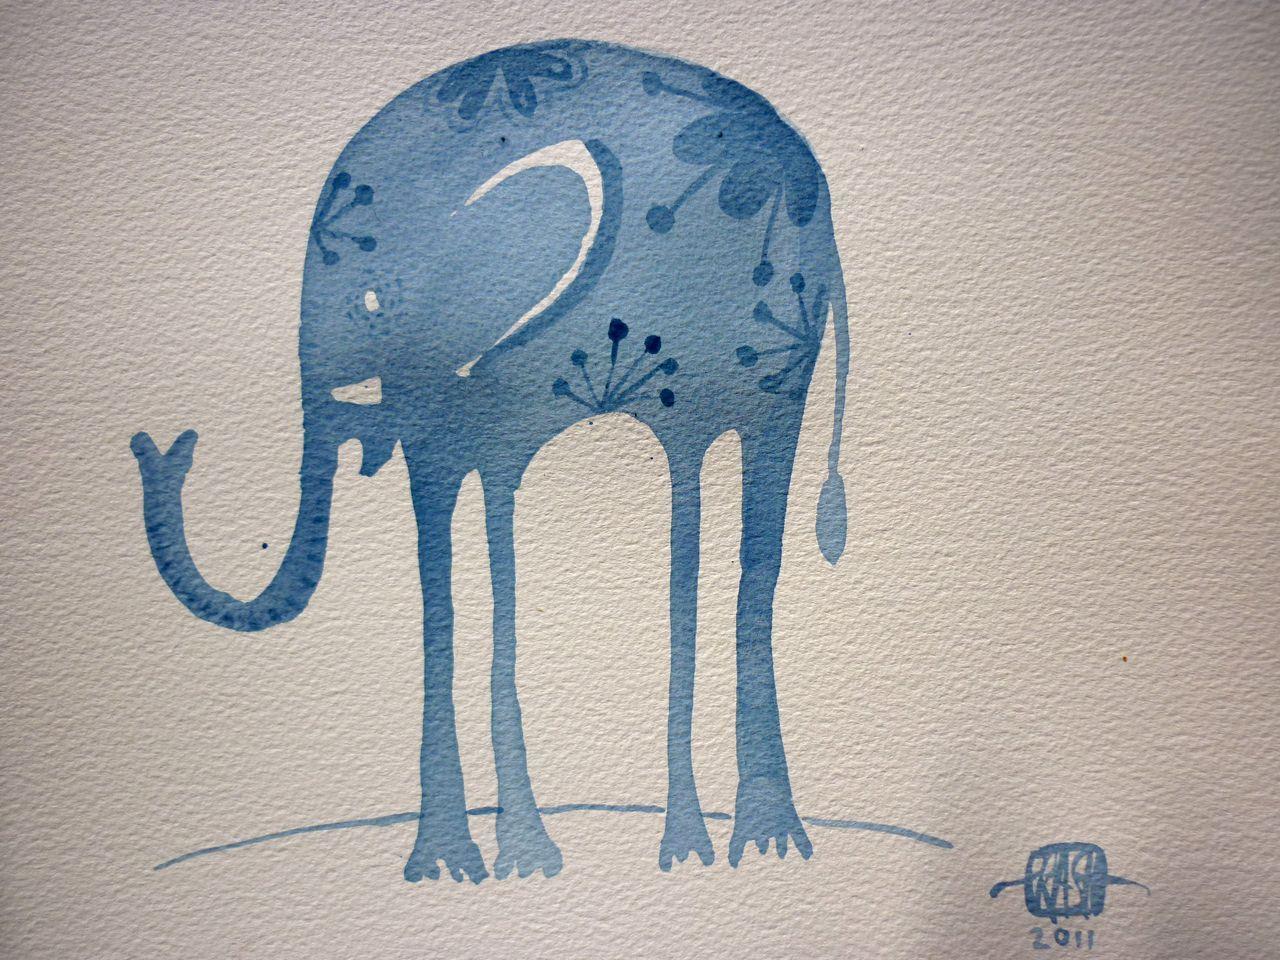 Vega Küchenbedarf ~ 23 best art images on pinterest art drawings artist and graphics